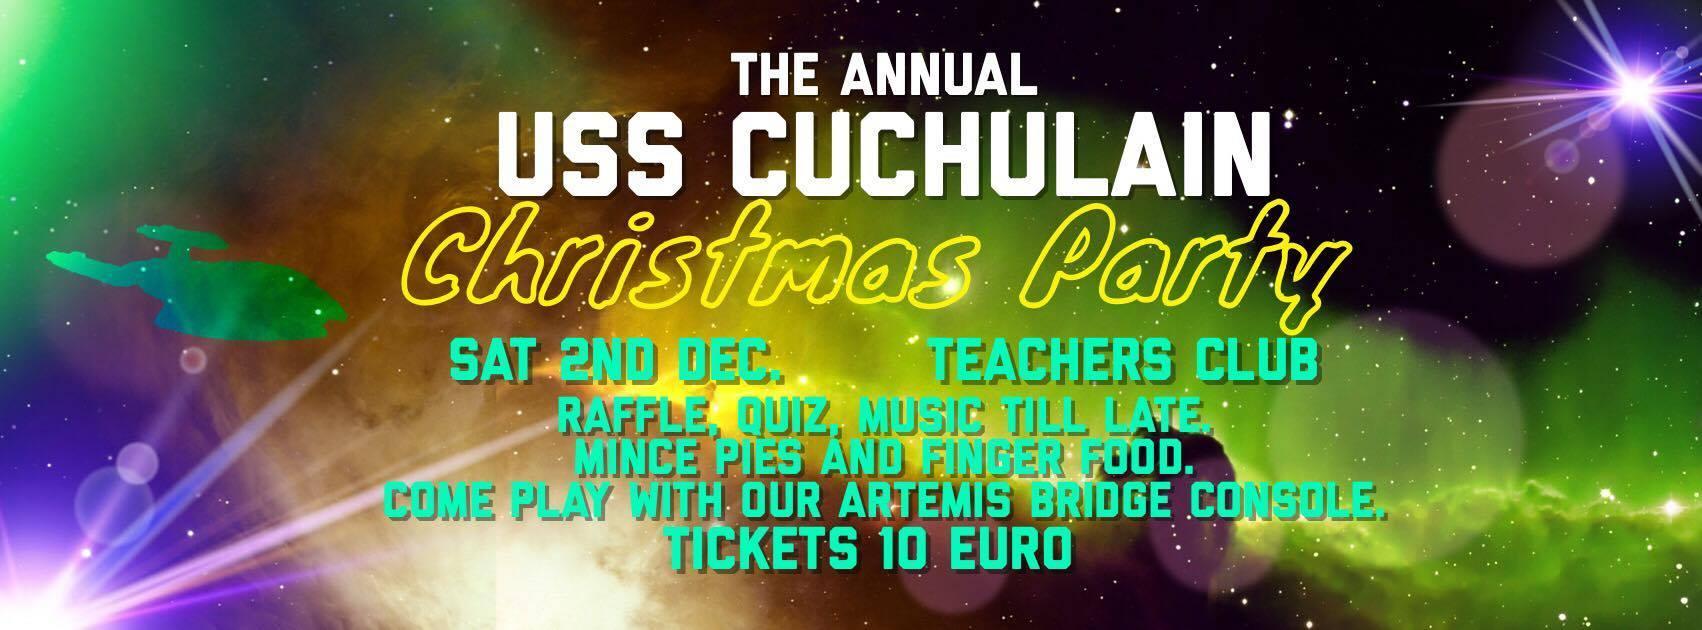 USS Cuchulain Christmas Shindig 2017